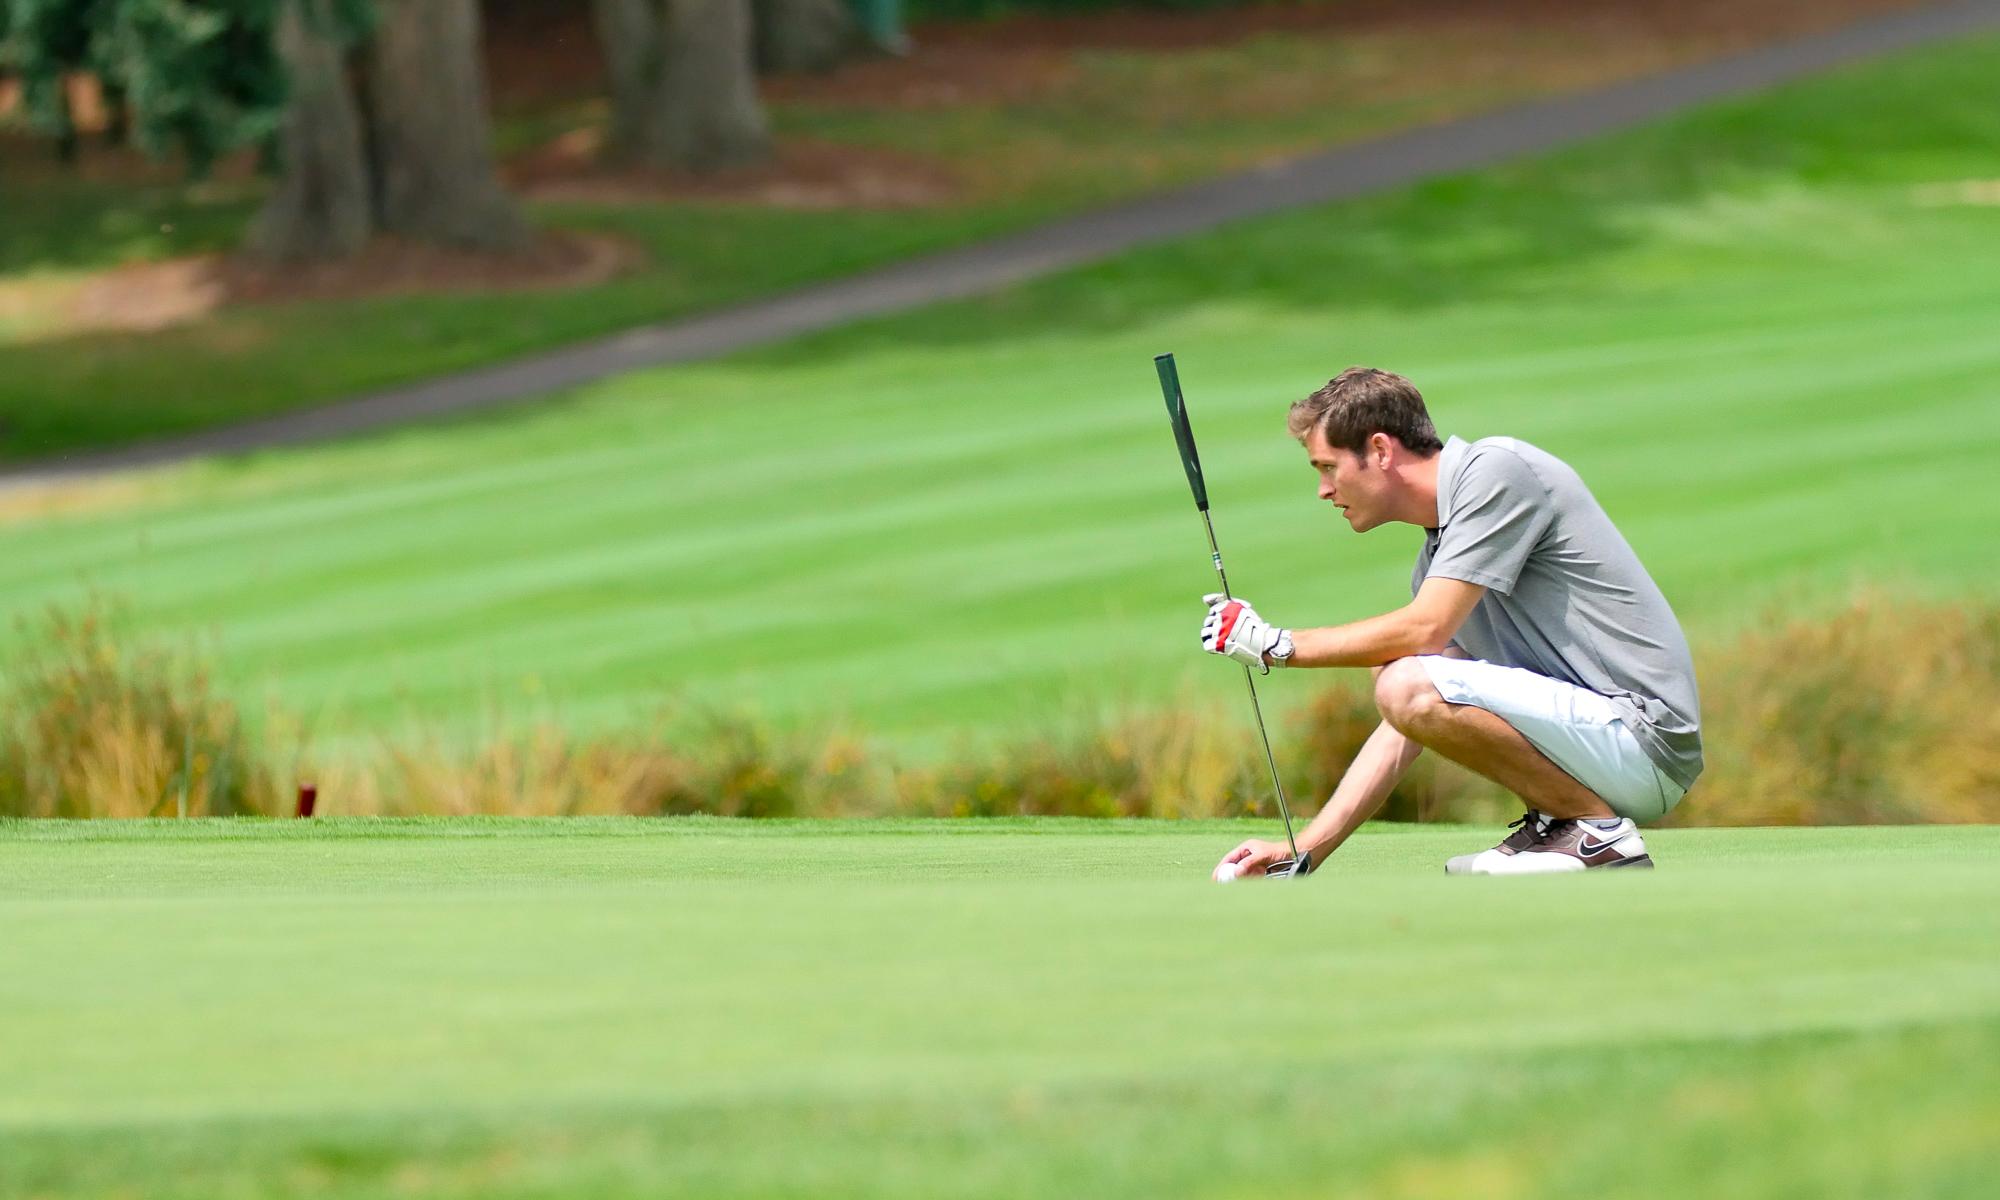 Levi_Sim_Golf_Sigma_120-300mm-1